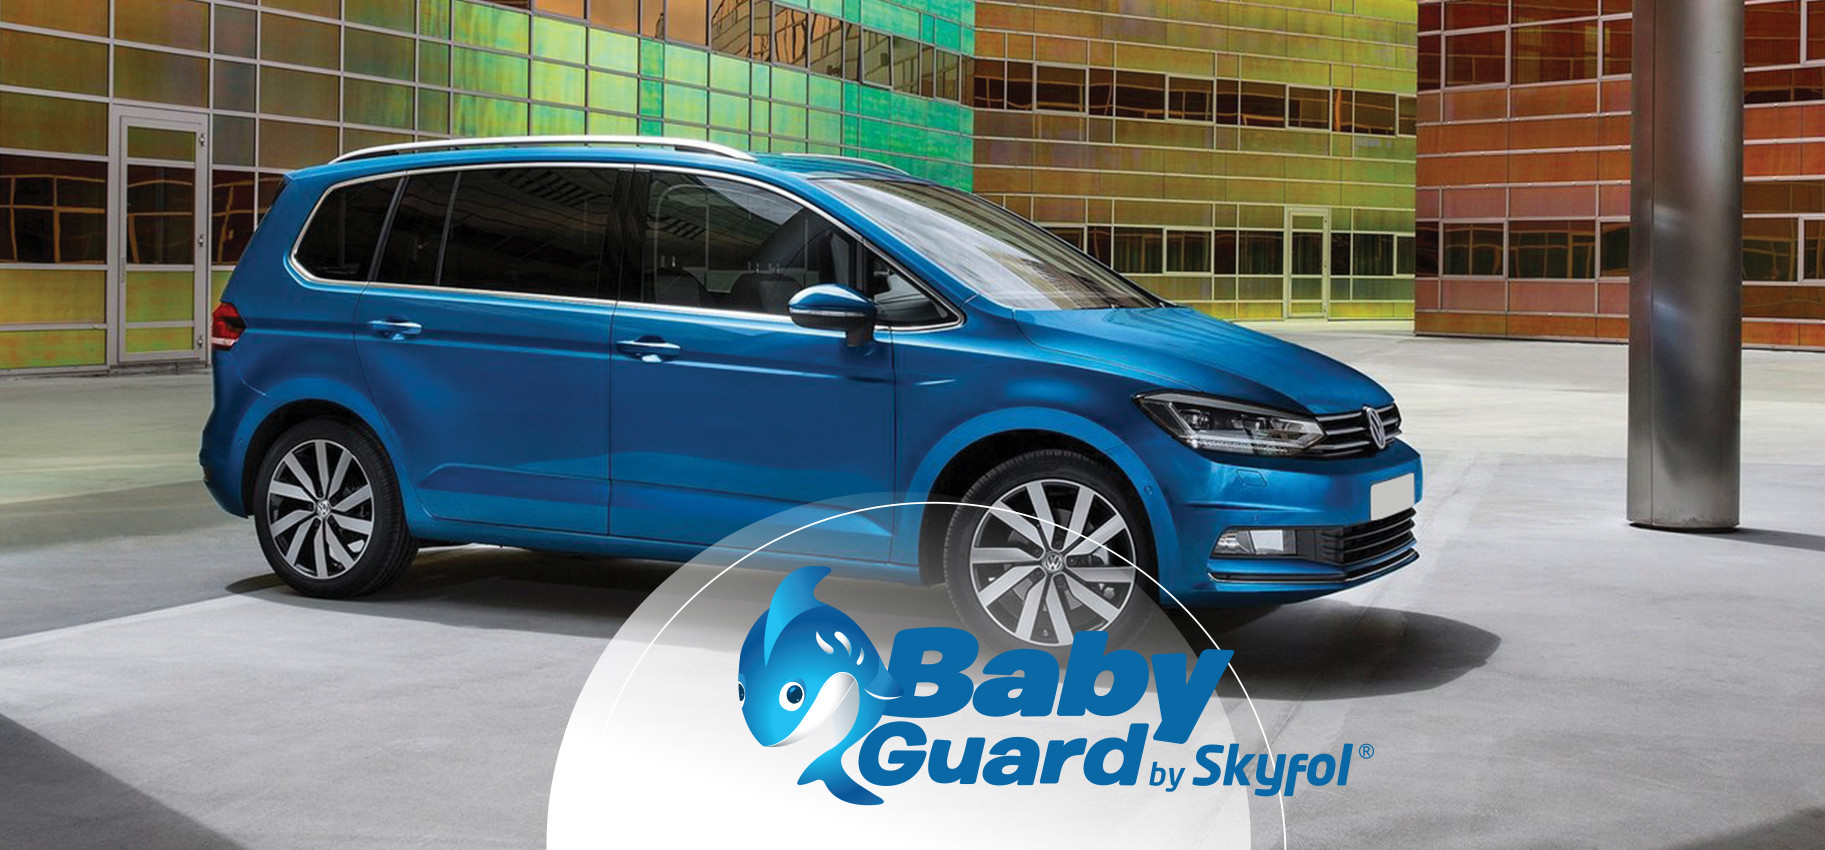 Skyfol BabyGuard